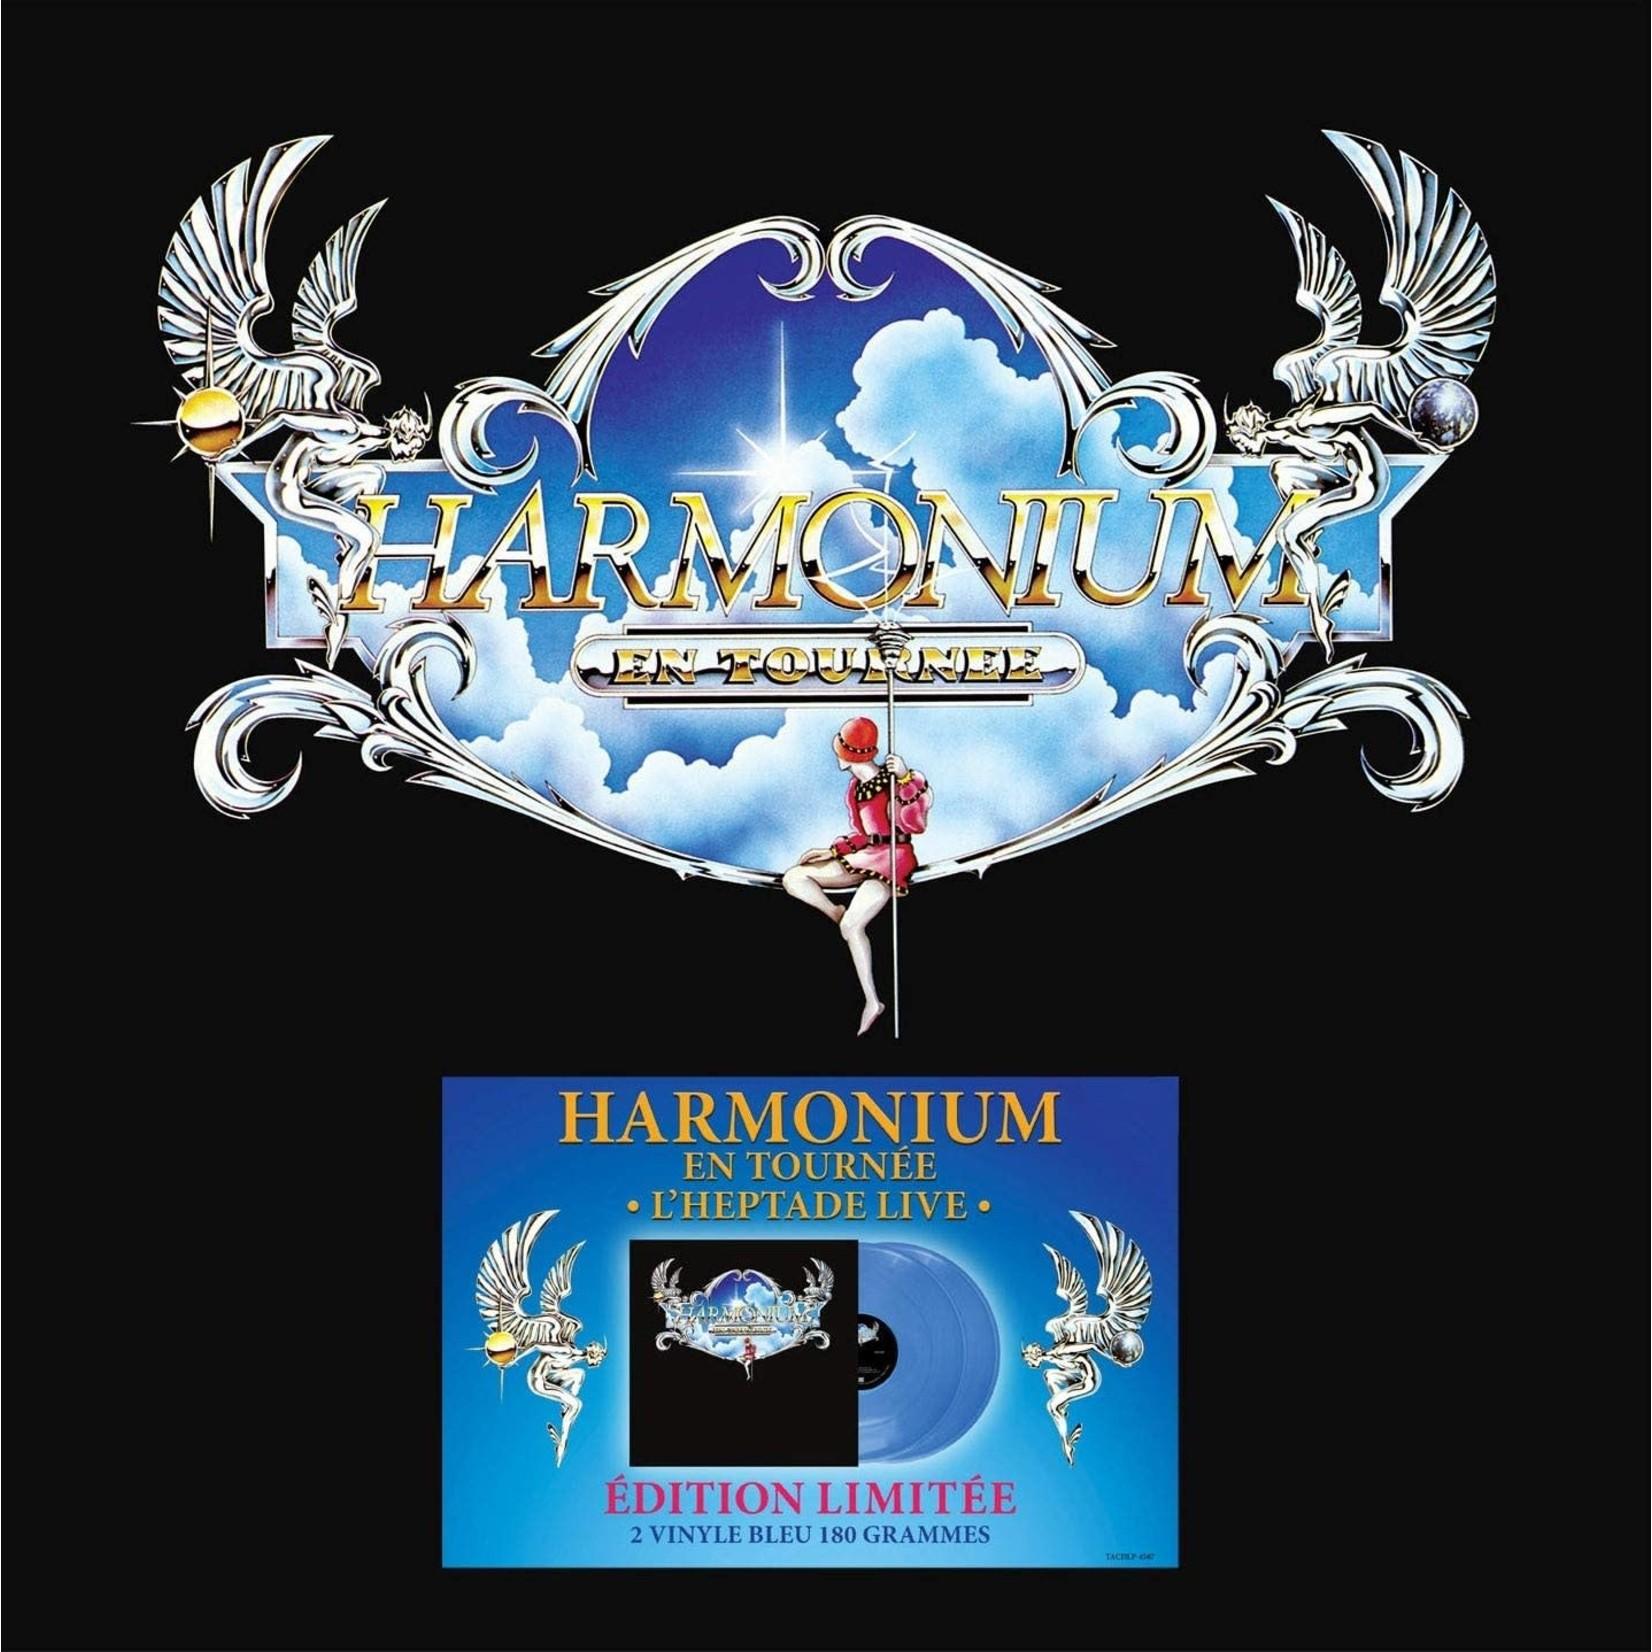 HARMONIUM EN TOURNEE (L'HEPTADE LIVE) 2 VINYLES BLEU, 180 GRAMMES